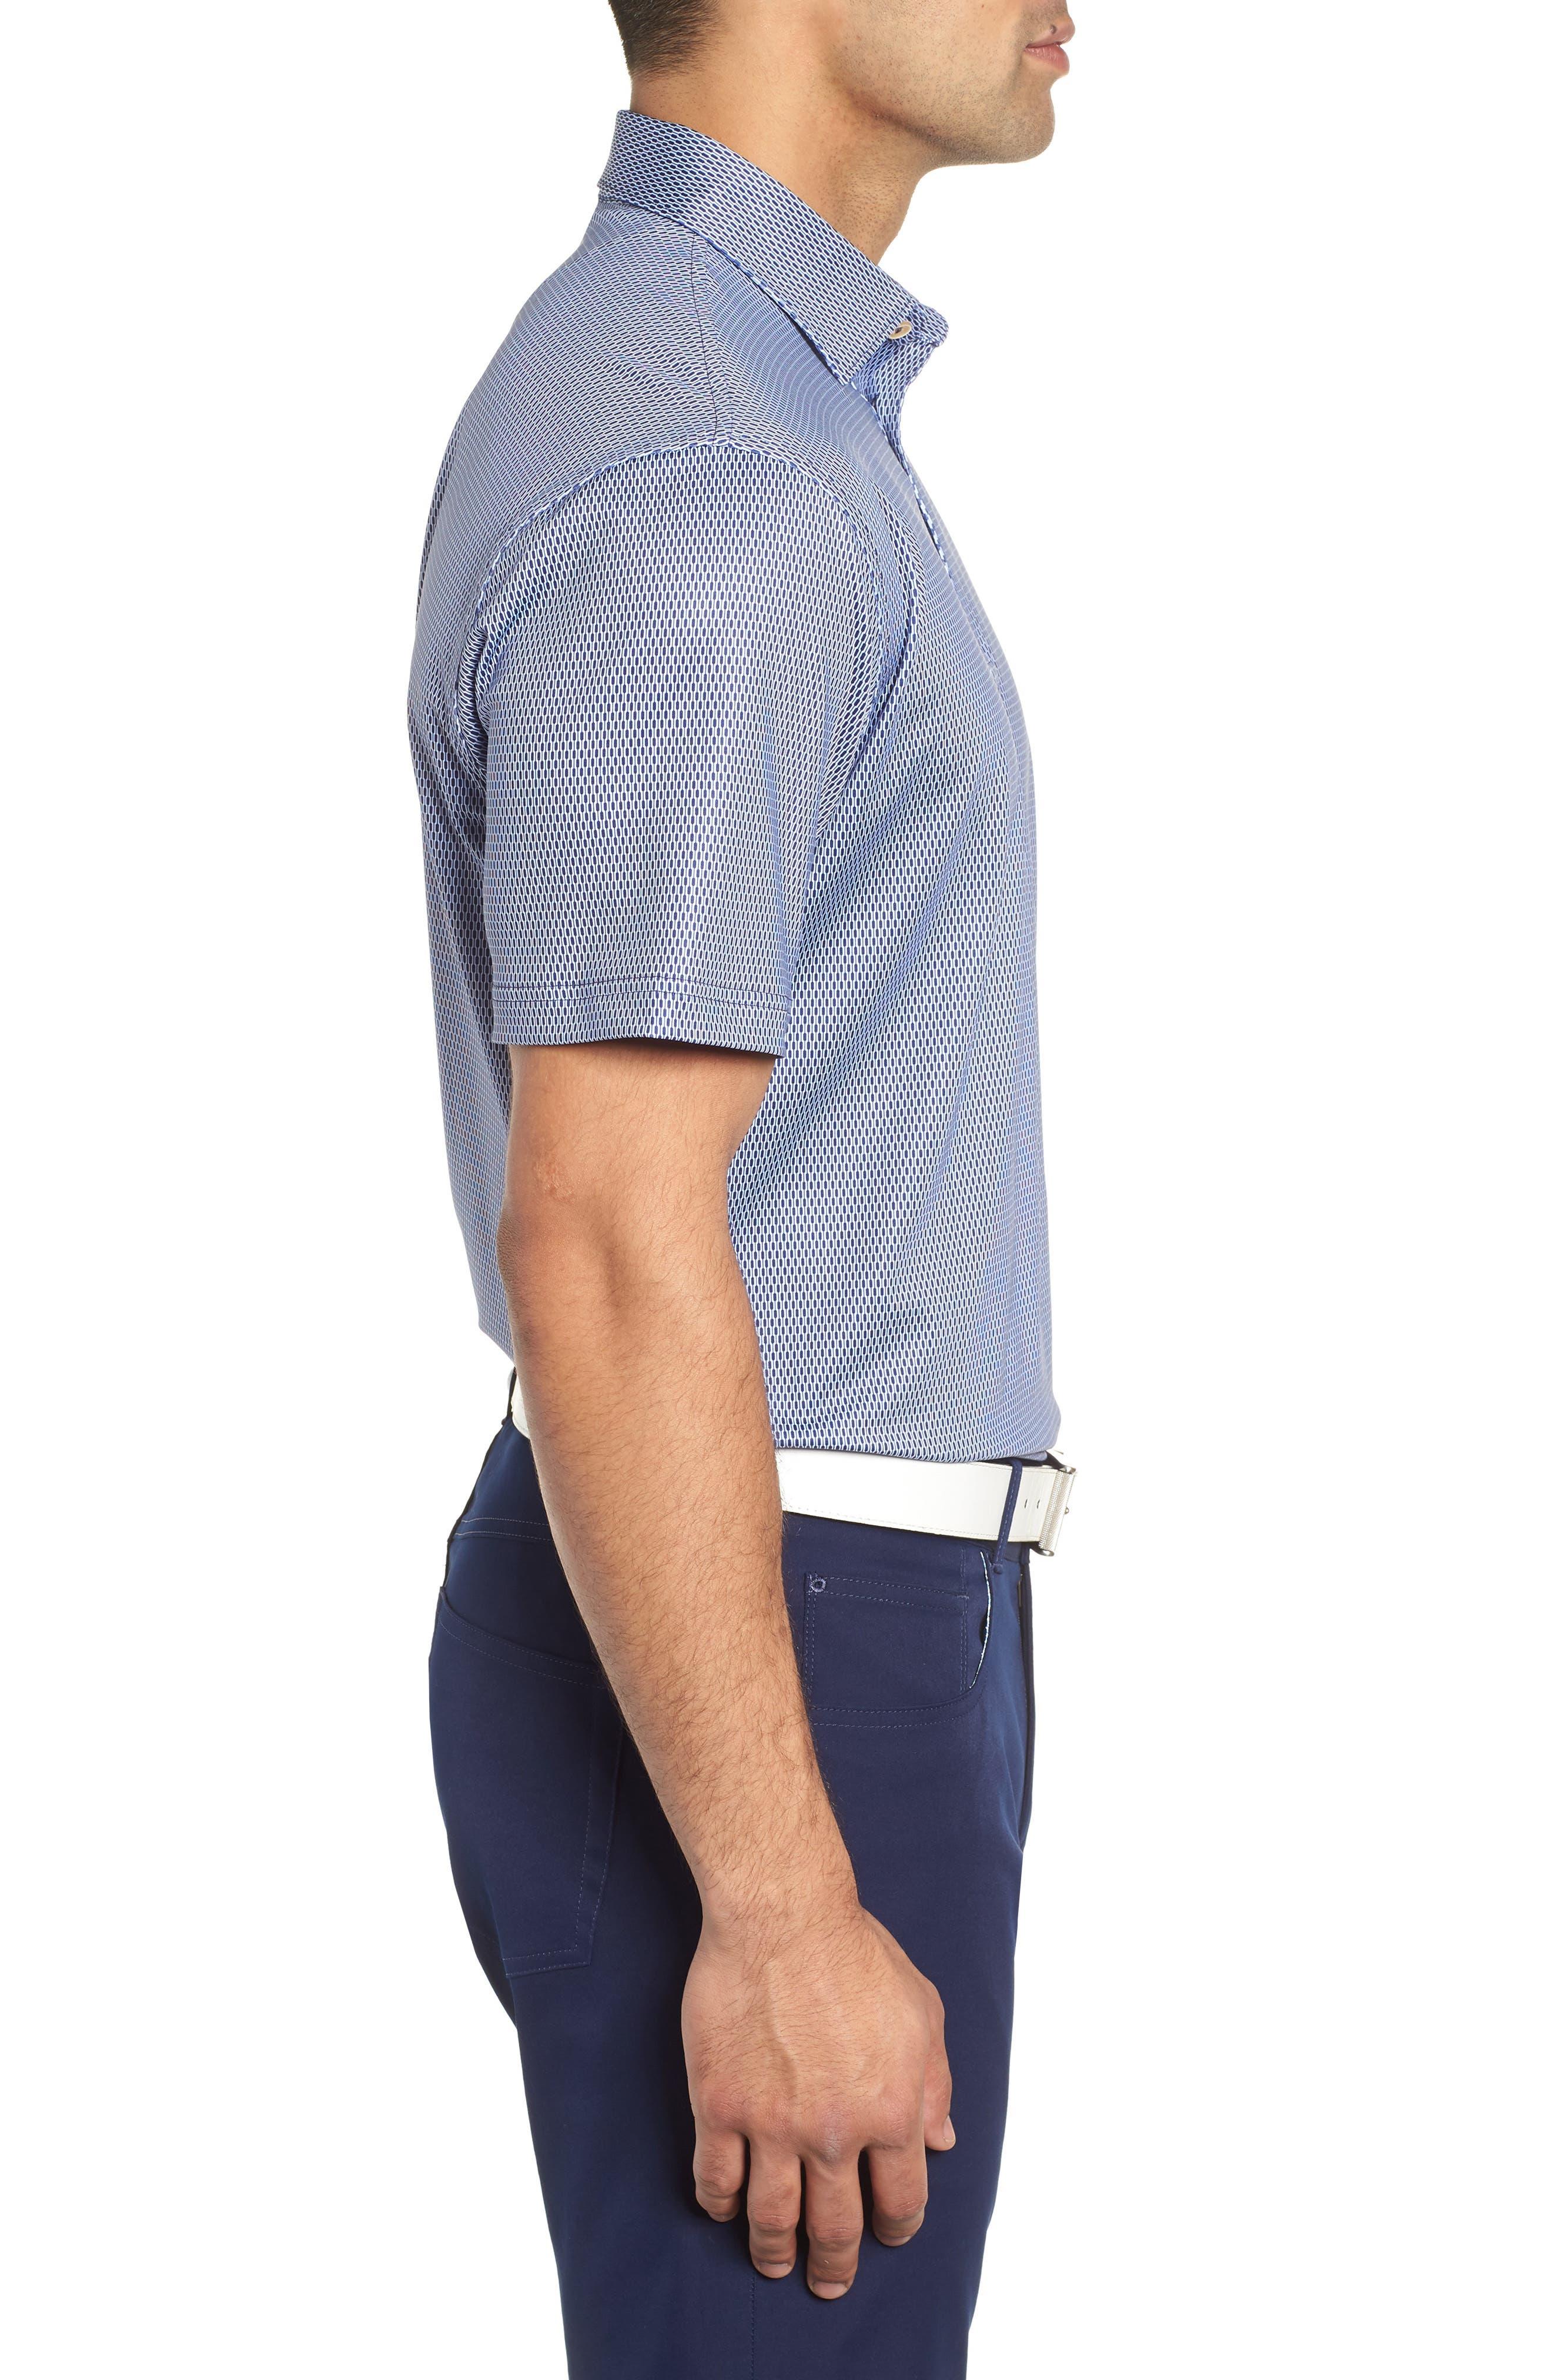 Latimer Classic Fit Links Print Golf Polo,                             Alternate thumbnail 3, color,                             410